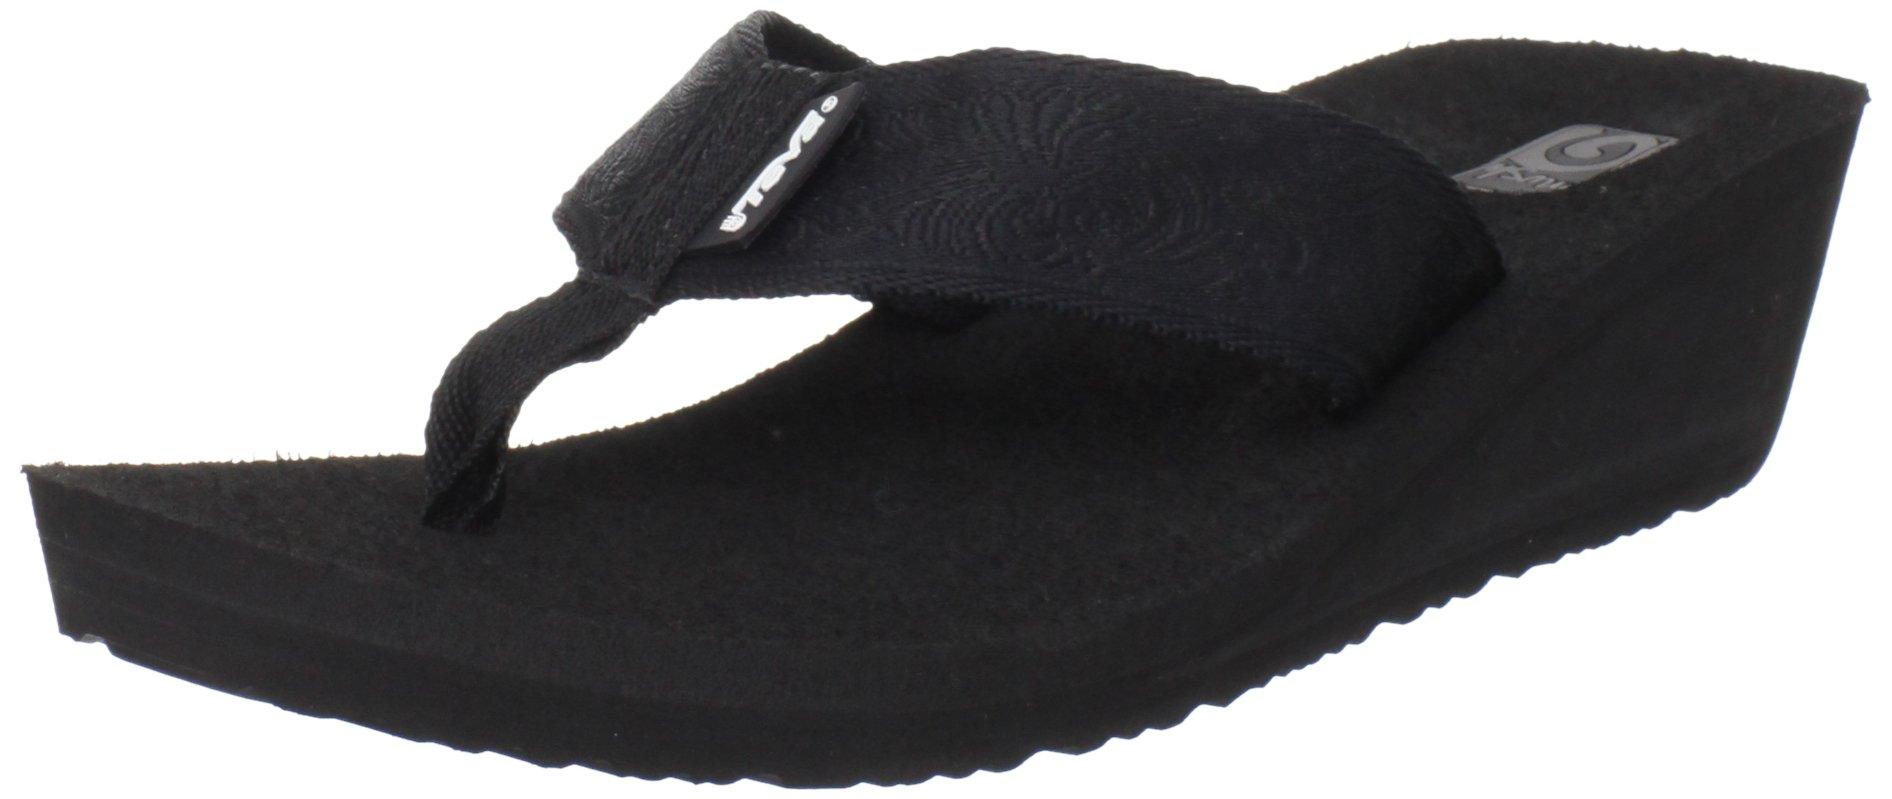 Teva Women's Mush Mandalyn Flip Flop,Motif Black,5 M US